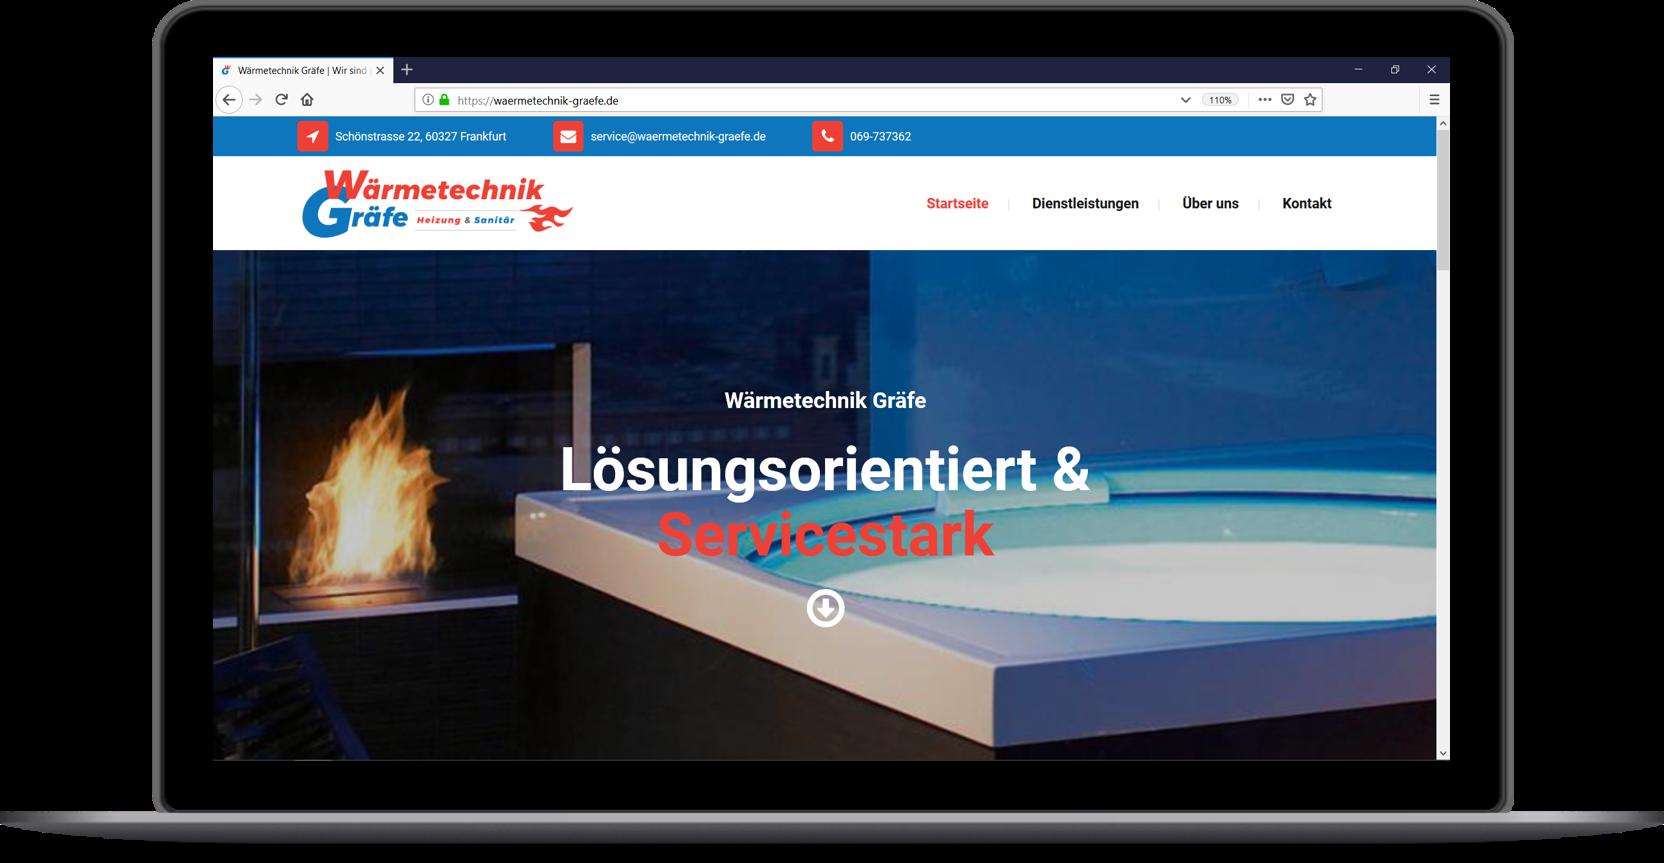 Website_Wärmetechnik_Gräfe_Frankfurt